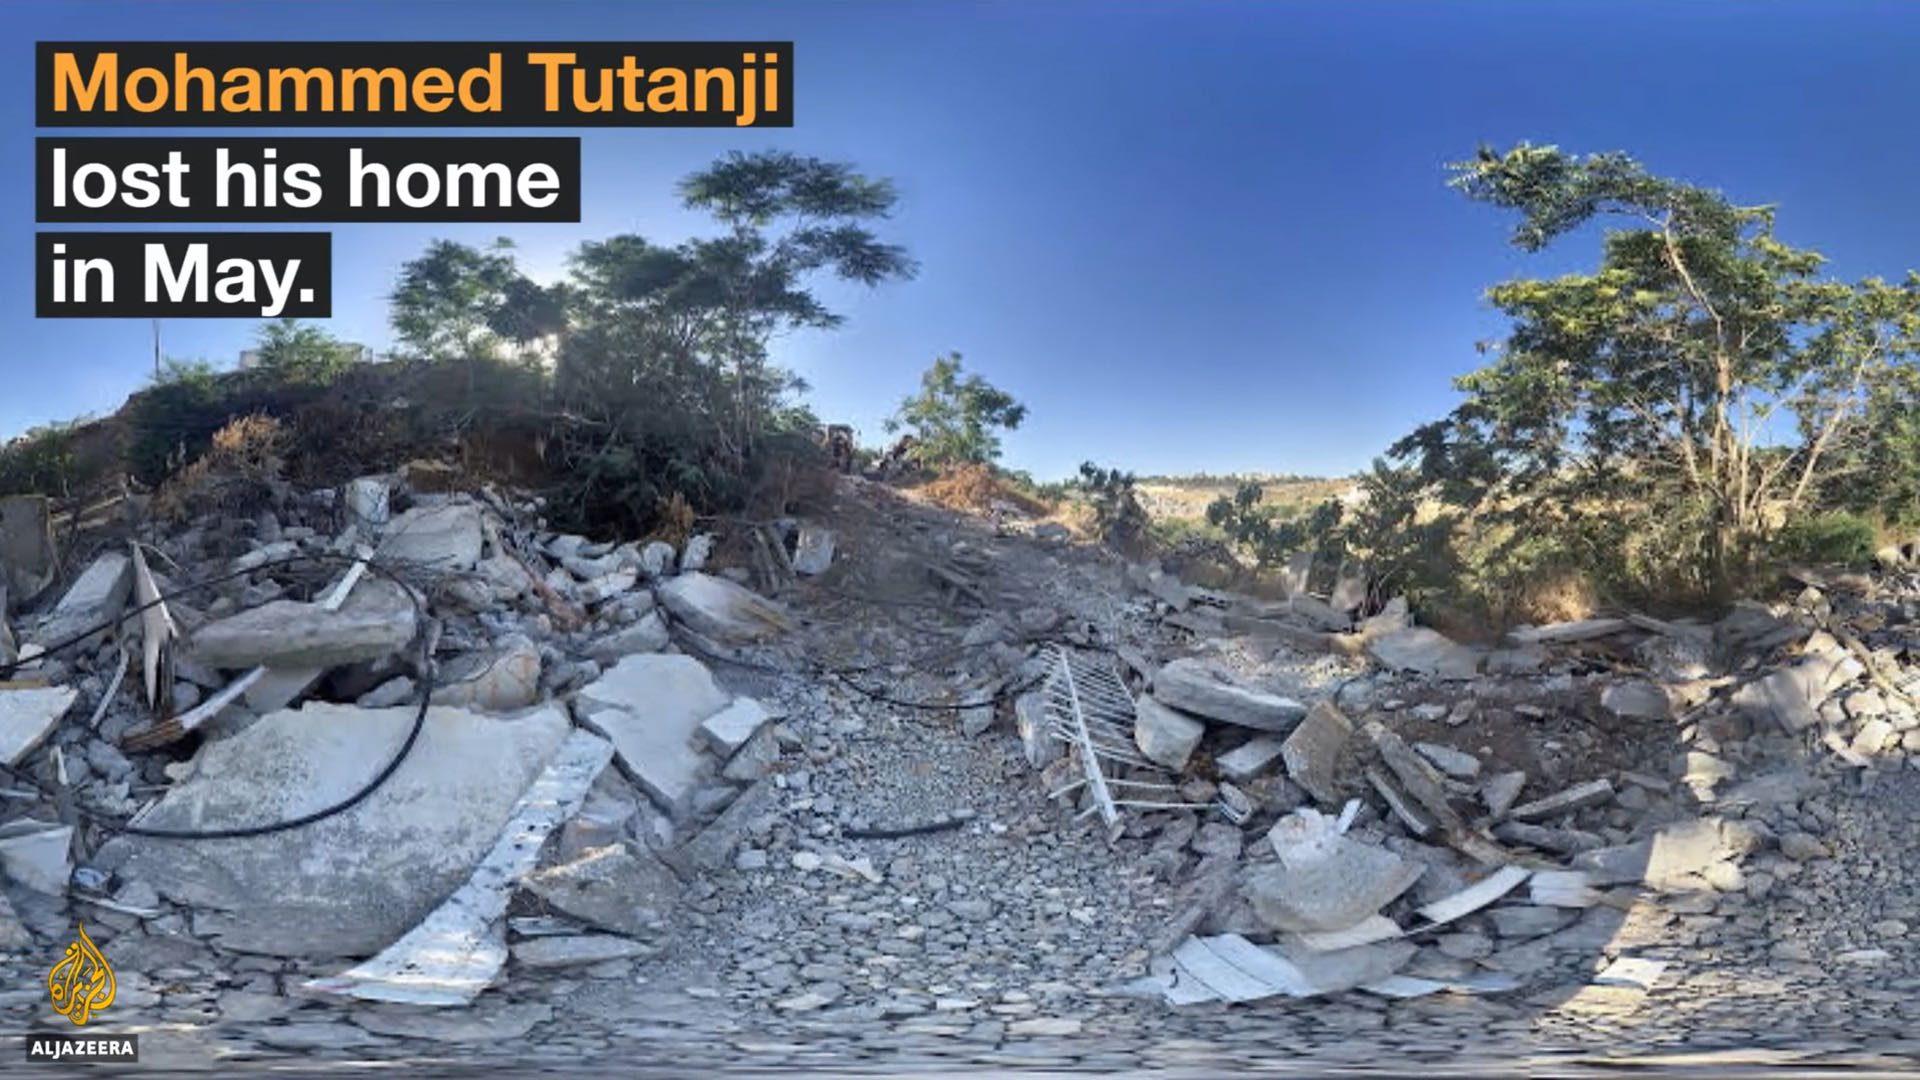 Figure 4.2. Panoramic photograph of home demolished in May 2016. Source: Al Jazeera.